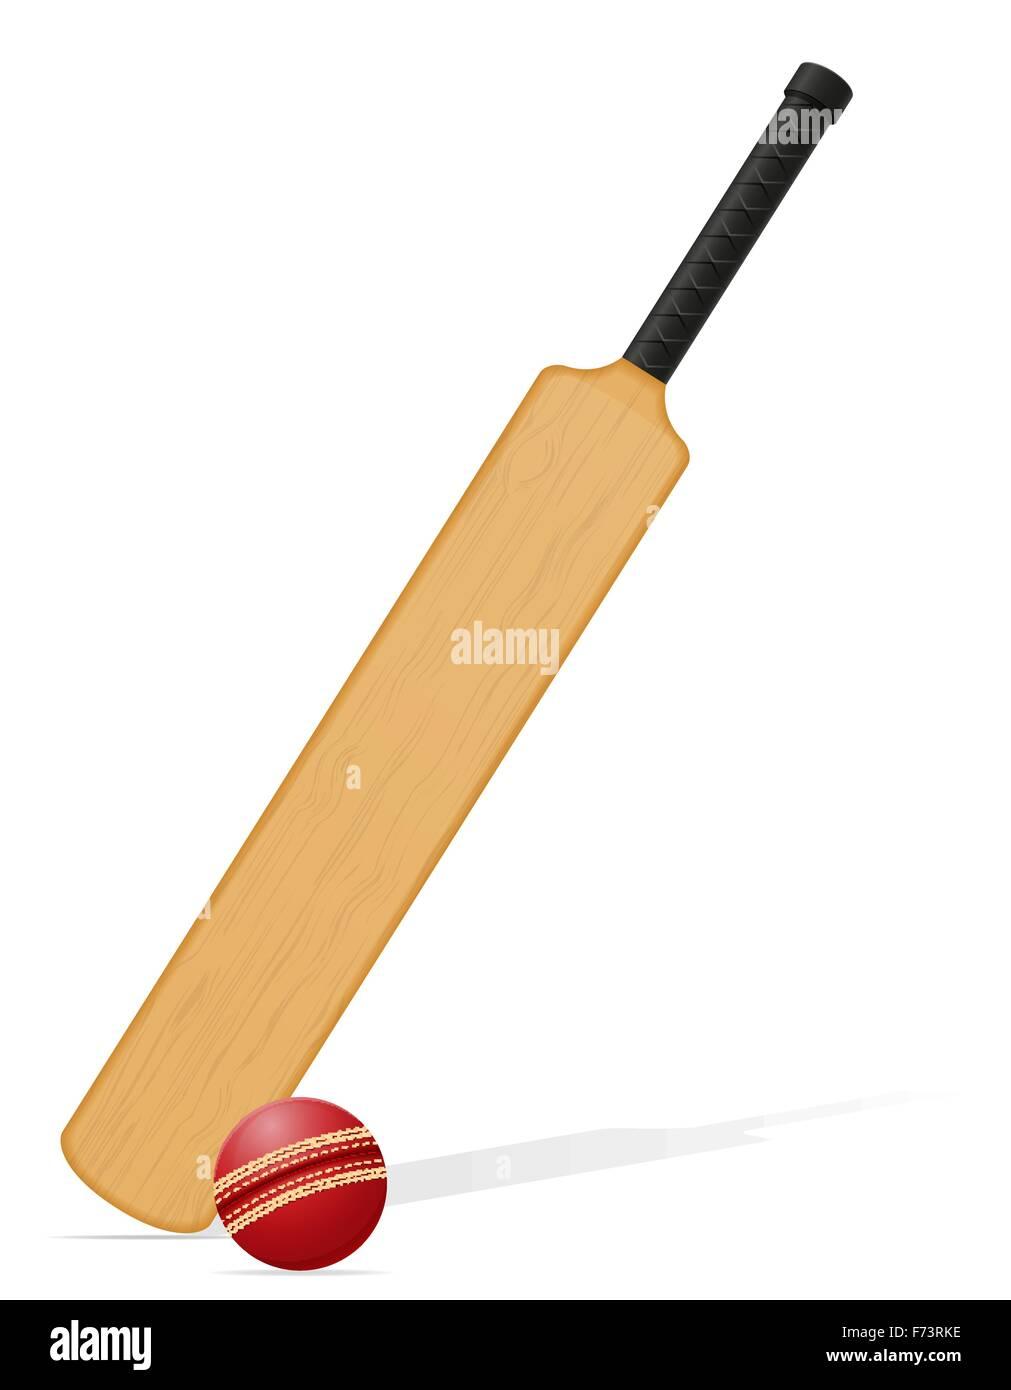 how to draw cricket bat